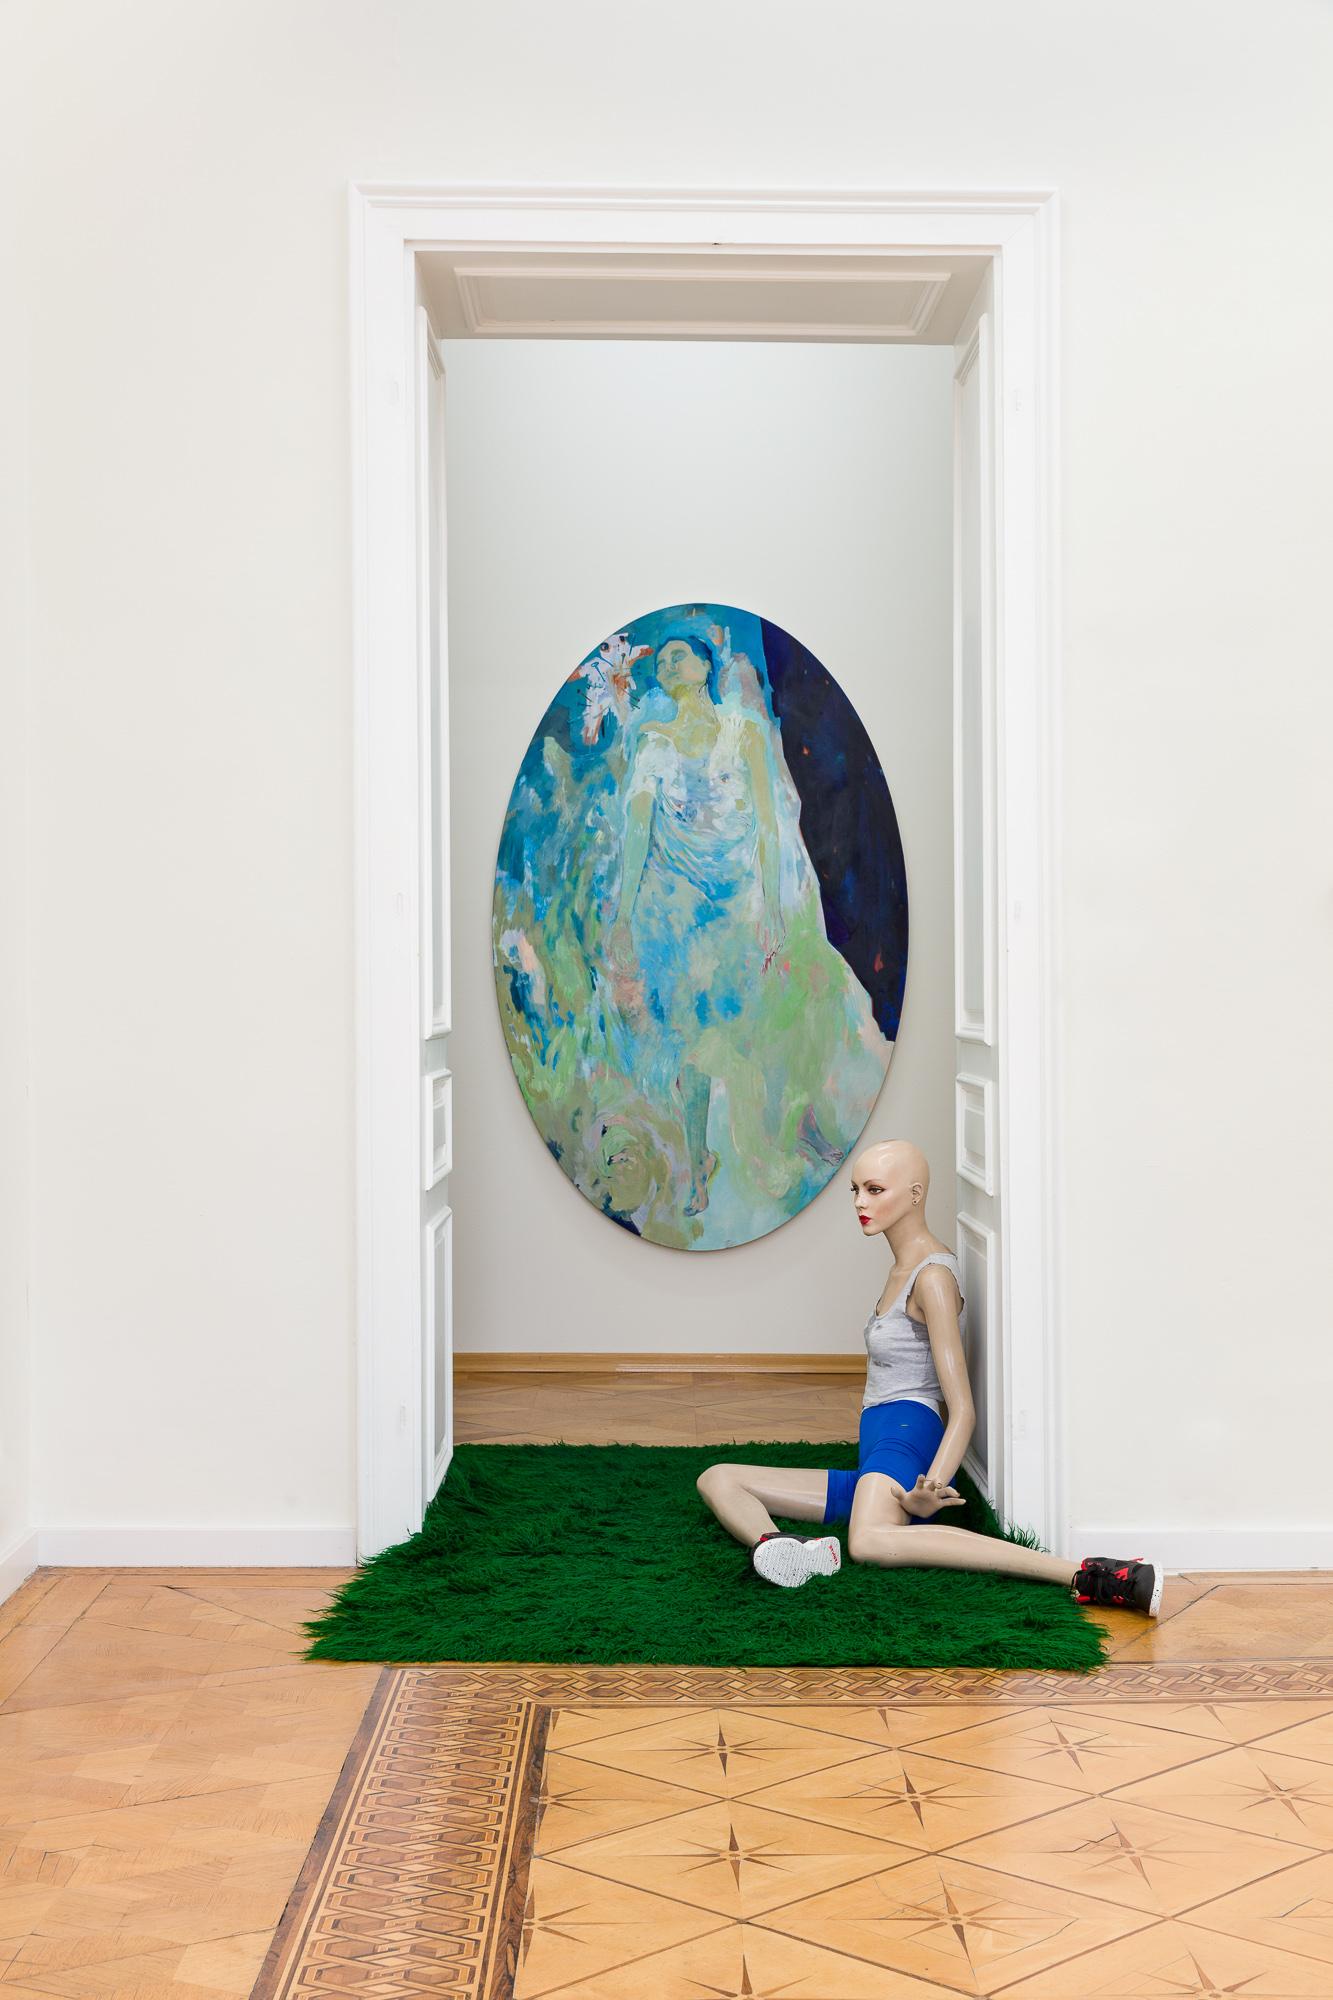 2019_01_28_Georgia Gardner Gray at Croy Nielsen by Kunstdokumentationcom_v2_003_web.jpg